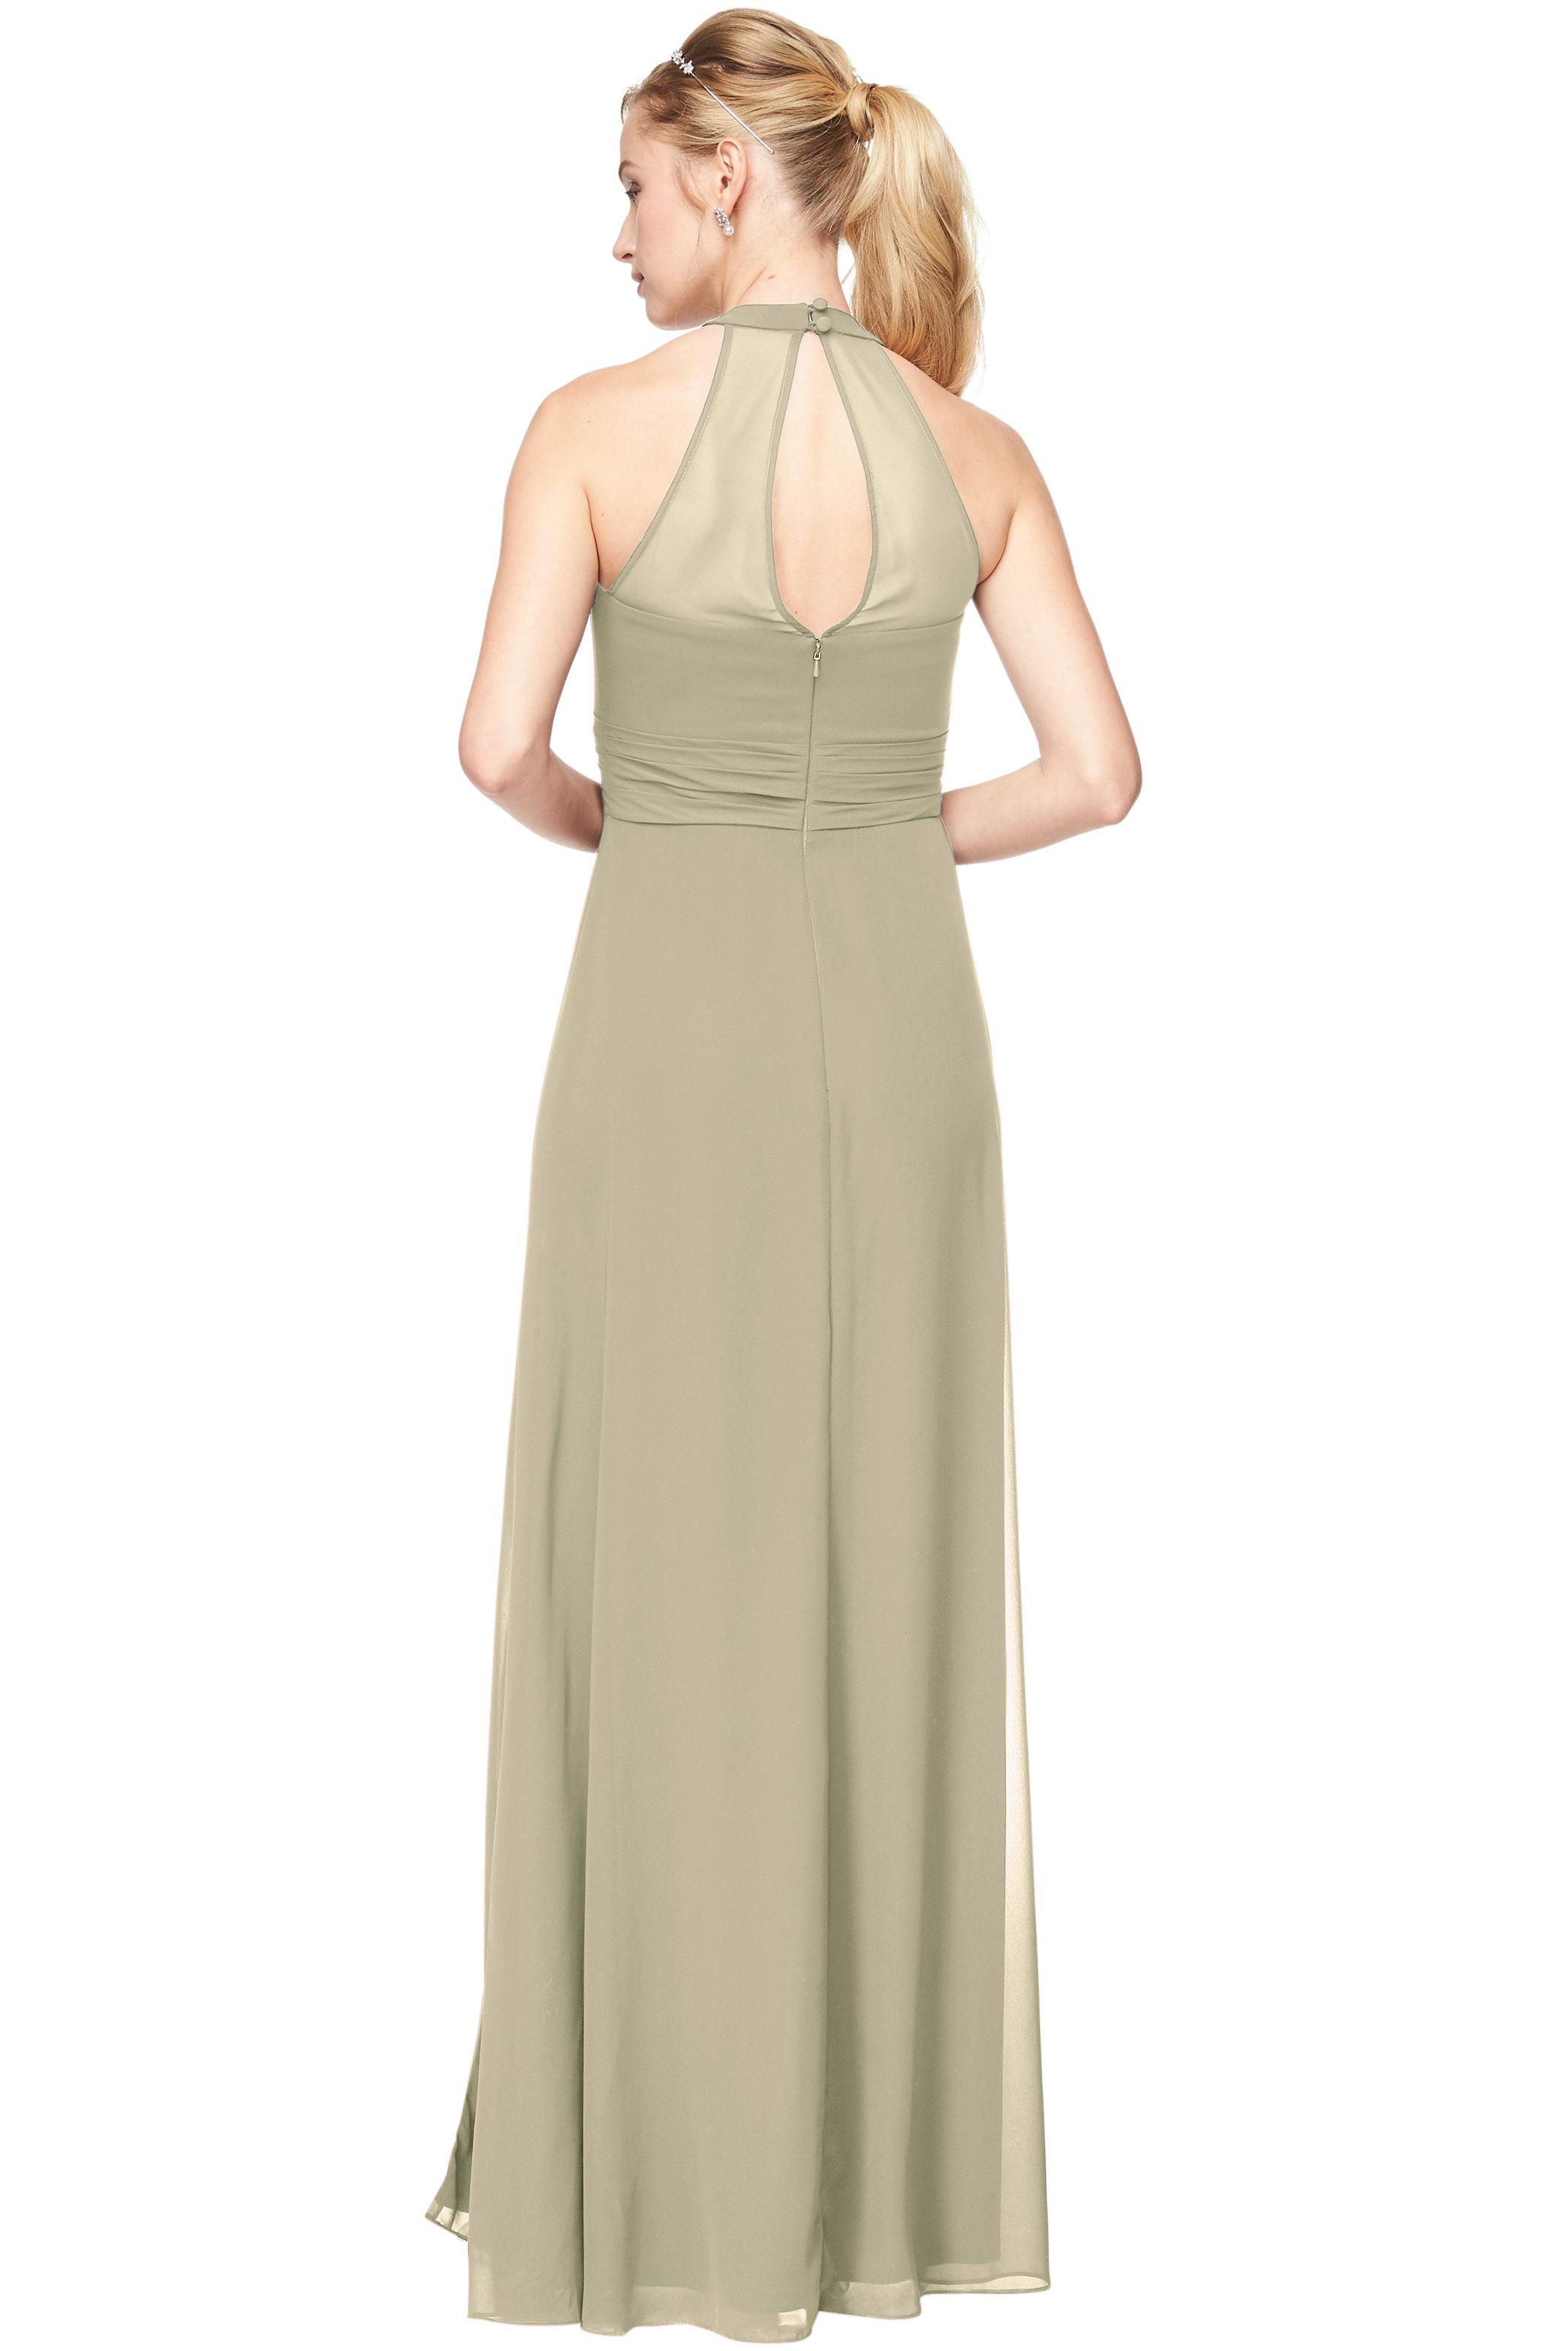 Bill Levkoff PISTACHIO Chiffon V-Neck A-Line gown, $198.00 Back